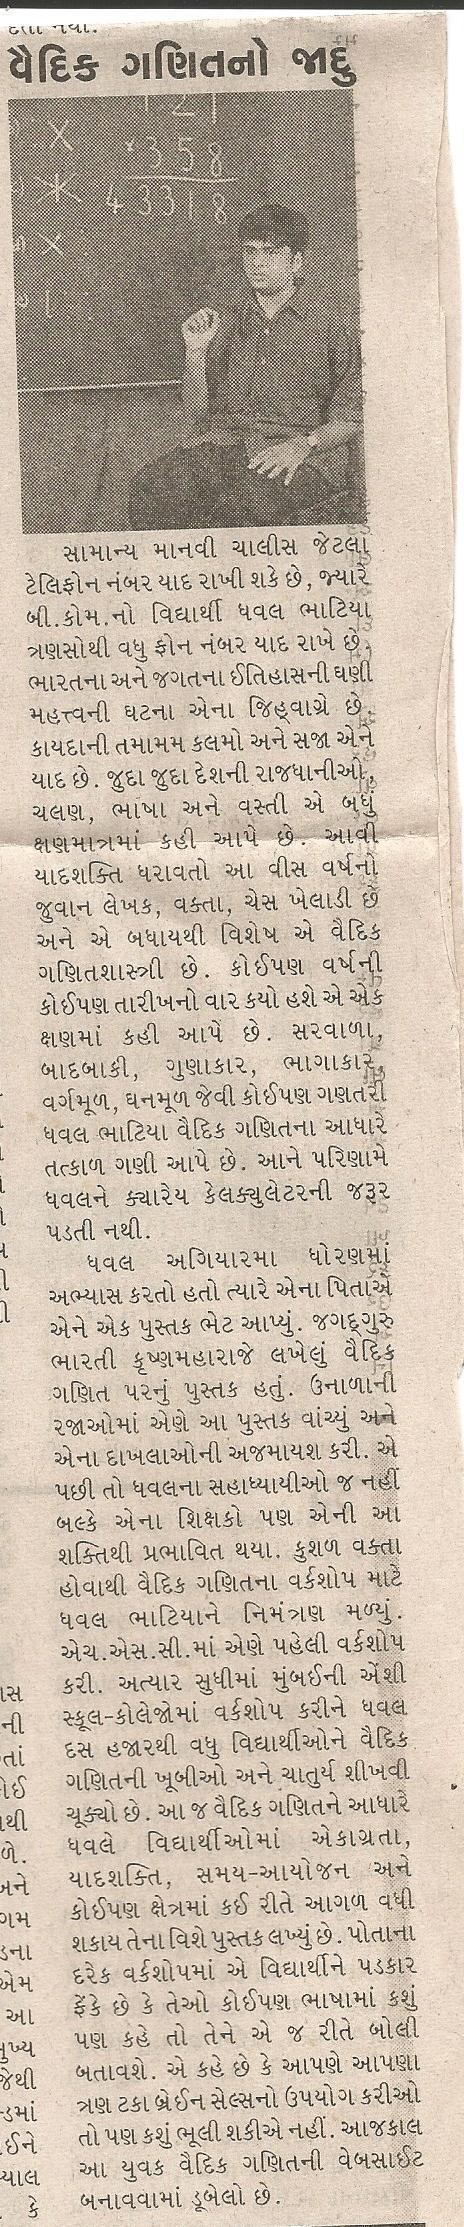 Gujarat Samachar (Gujarati Language)